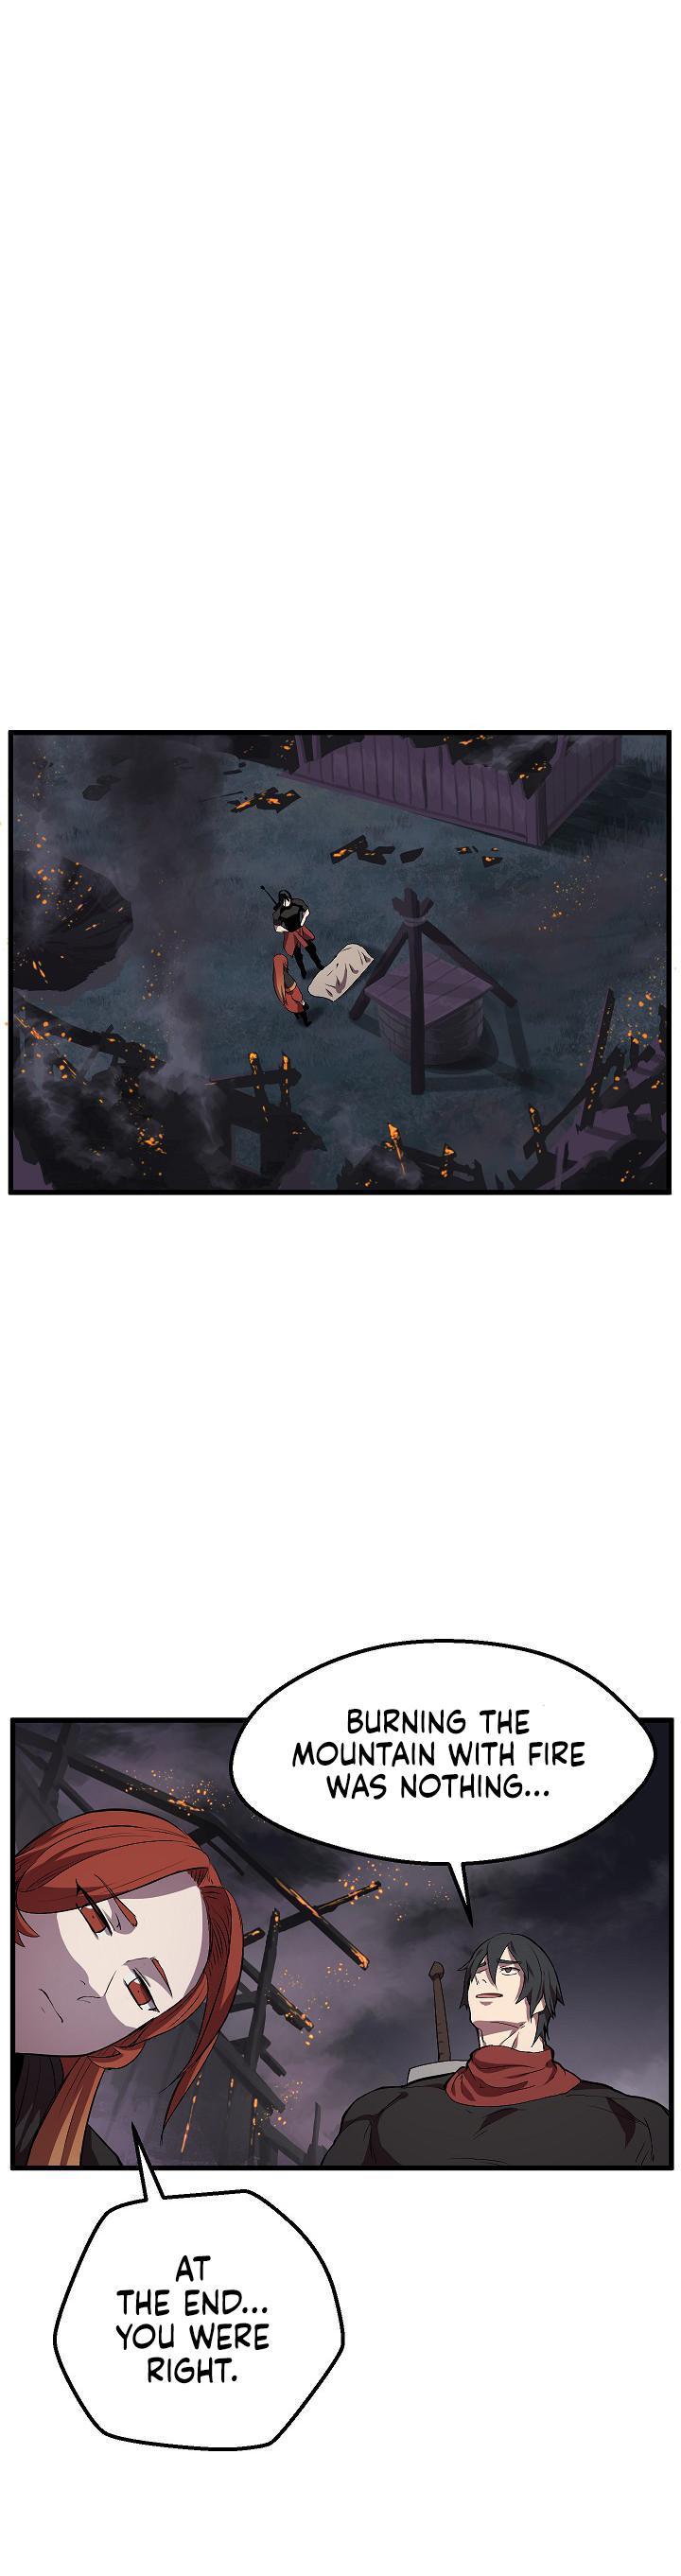 Survival Story Of A Sword King In A Fantasy World Vol.1 Chapter 16 page 28 - Mangakakalots.com